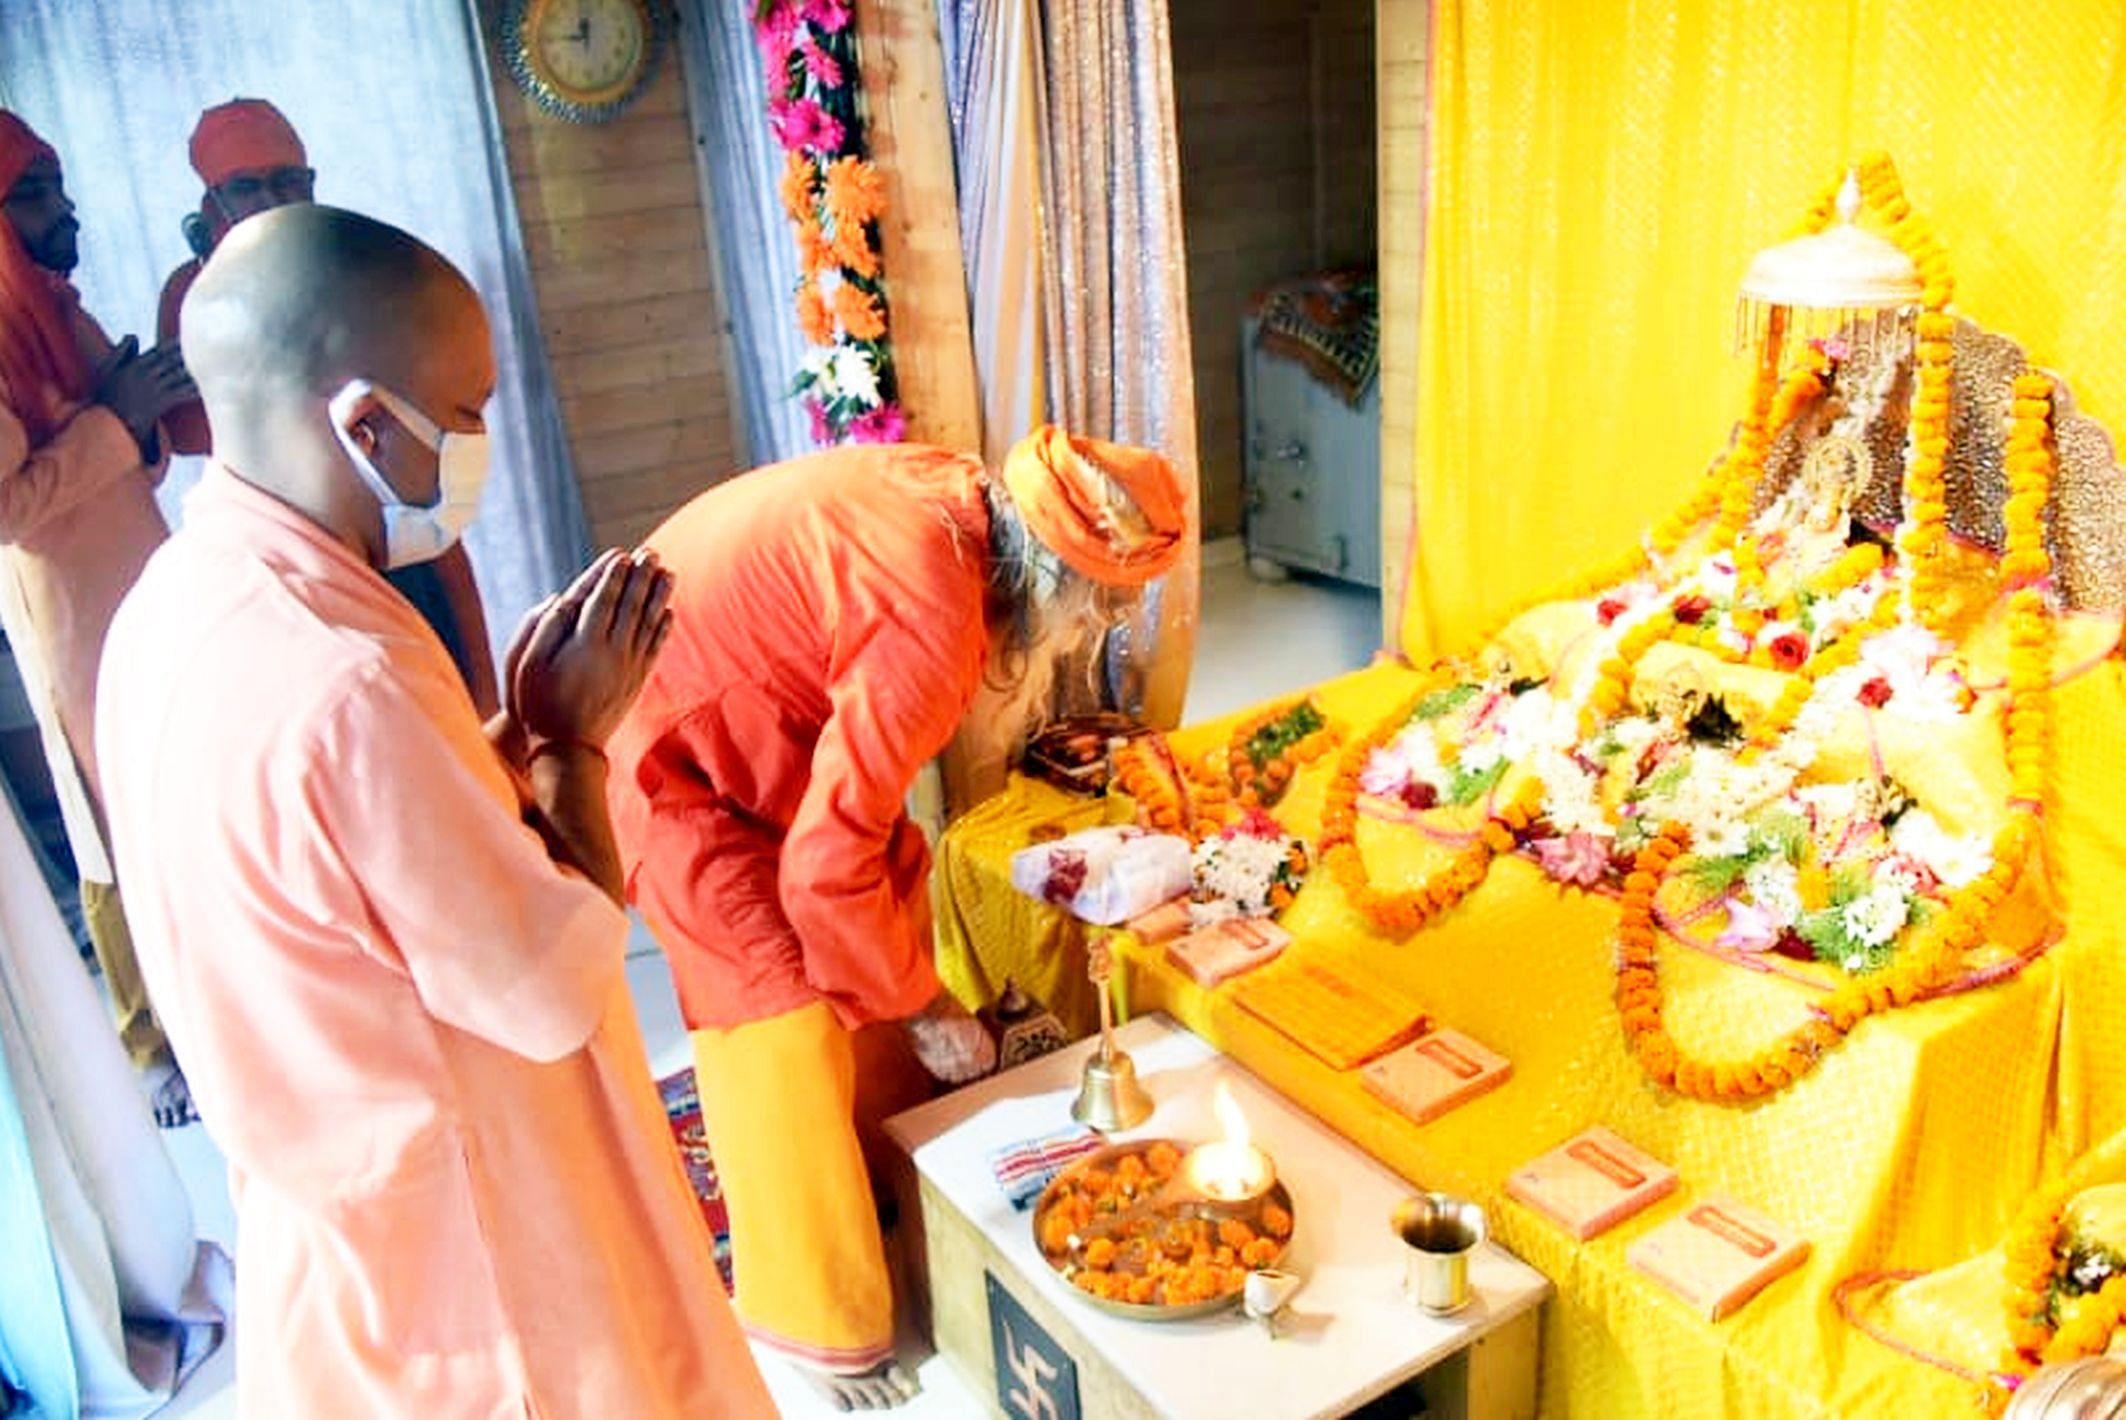 अयोध्या-रामजन्मभूमि परिसर में रामलला का पूजन करते मुख्यमंत्री योगी आदित्यनाथ